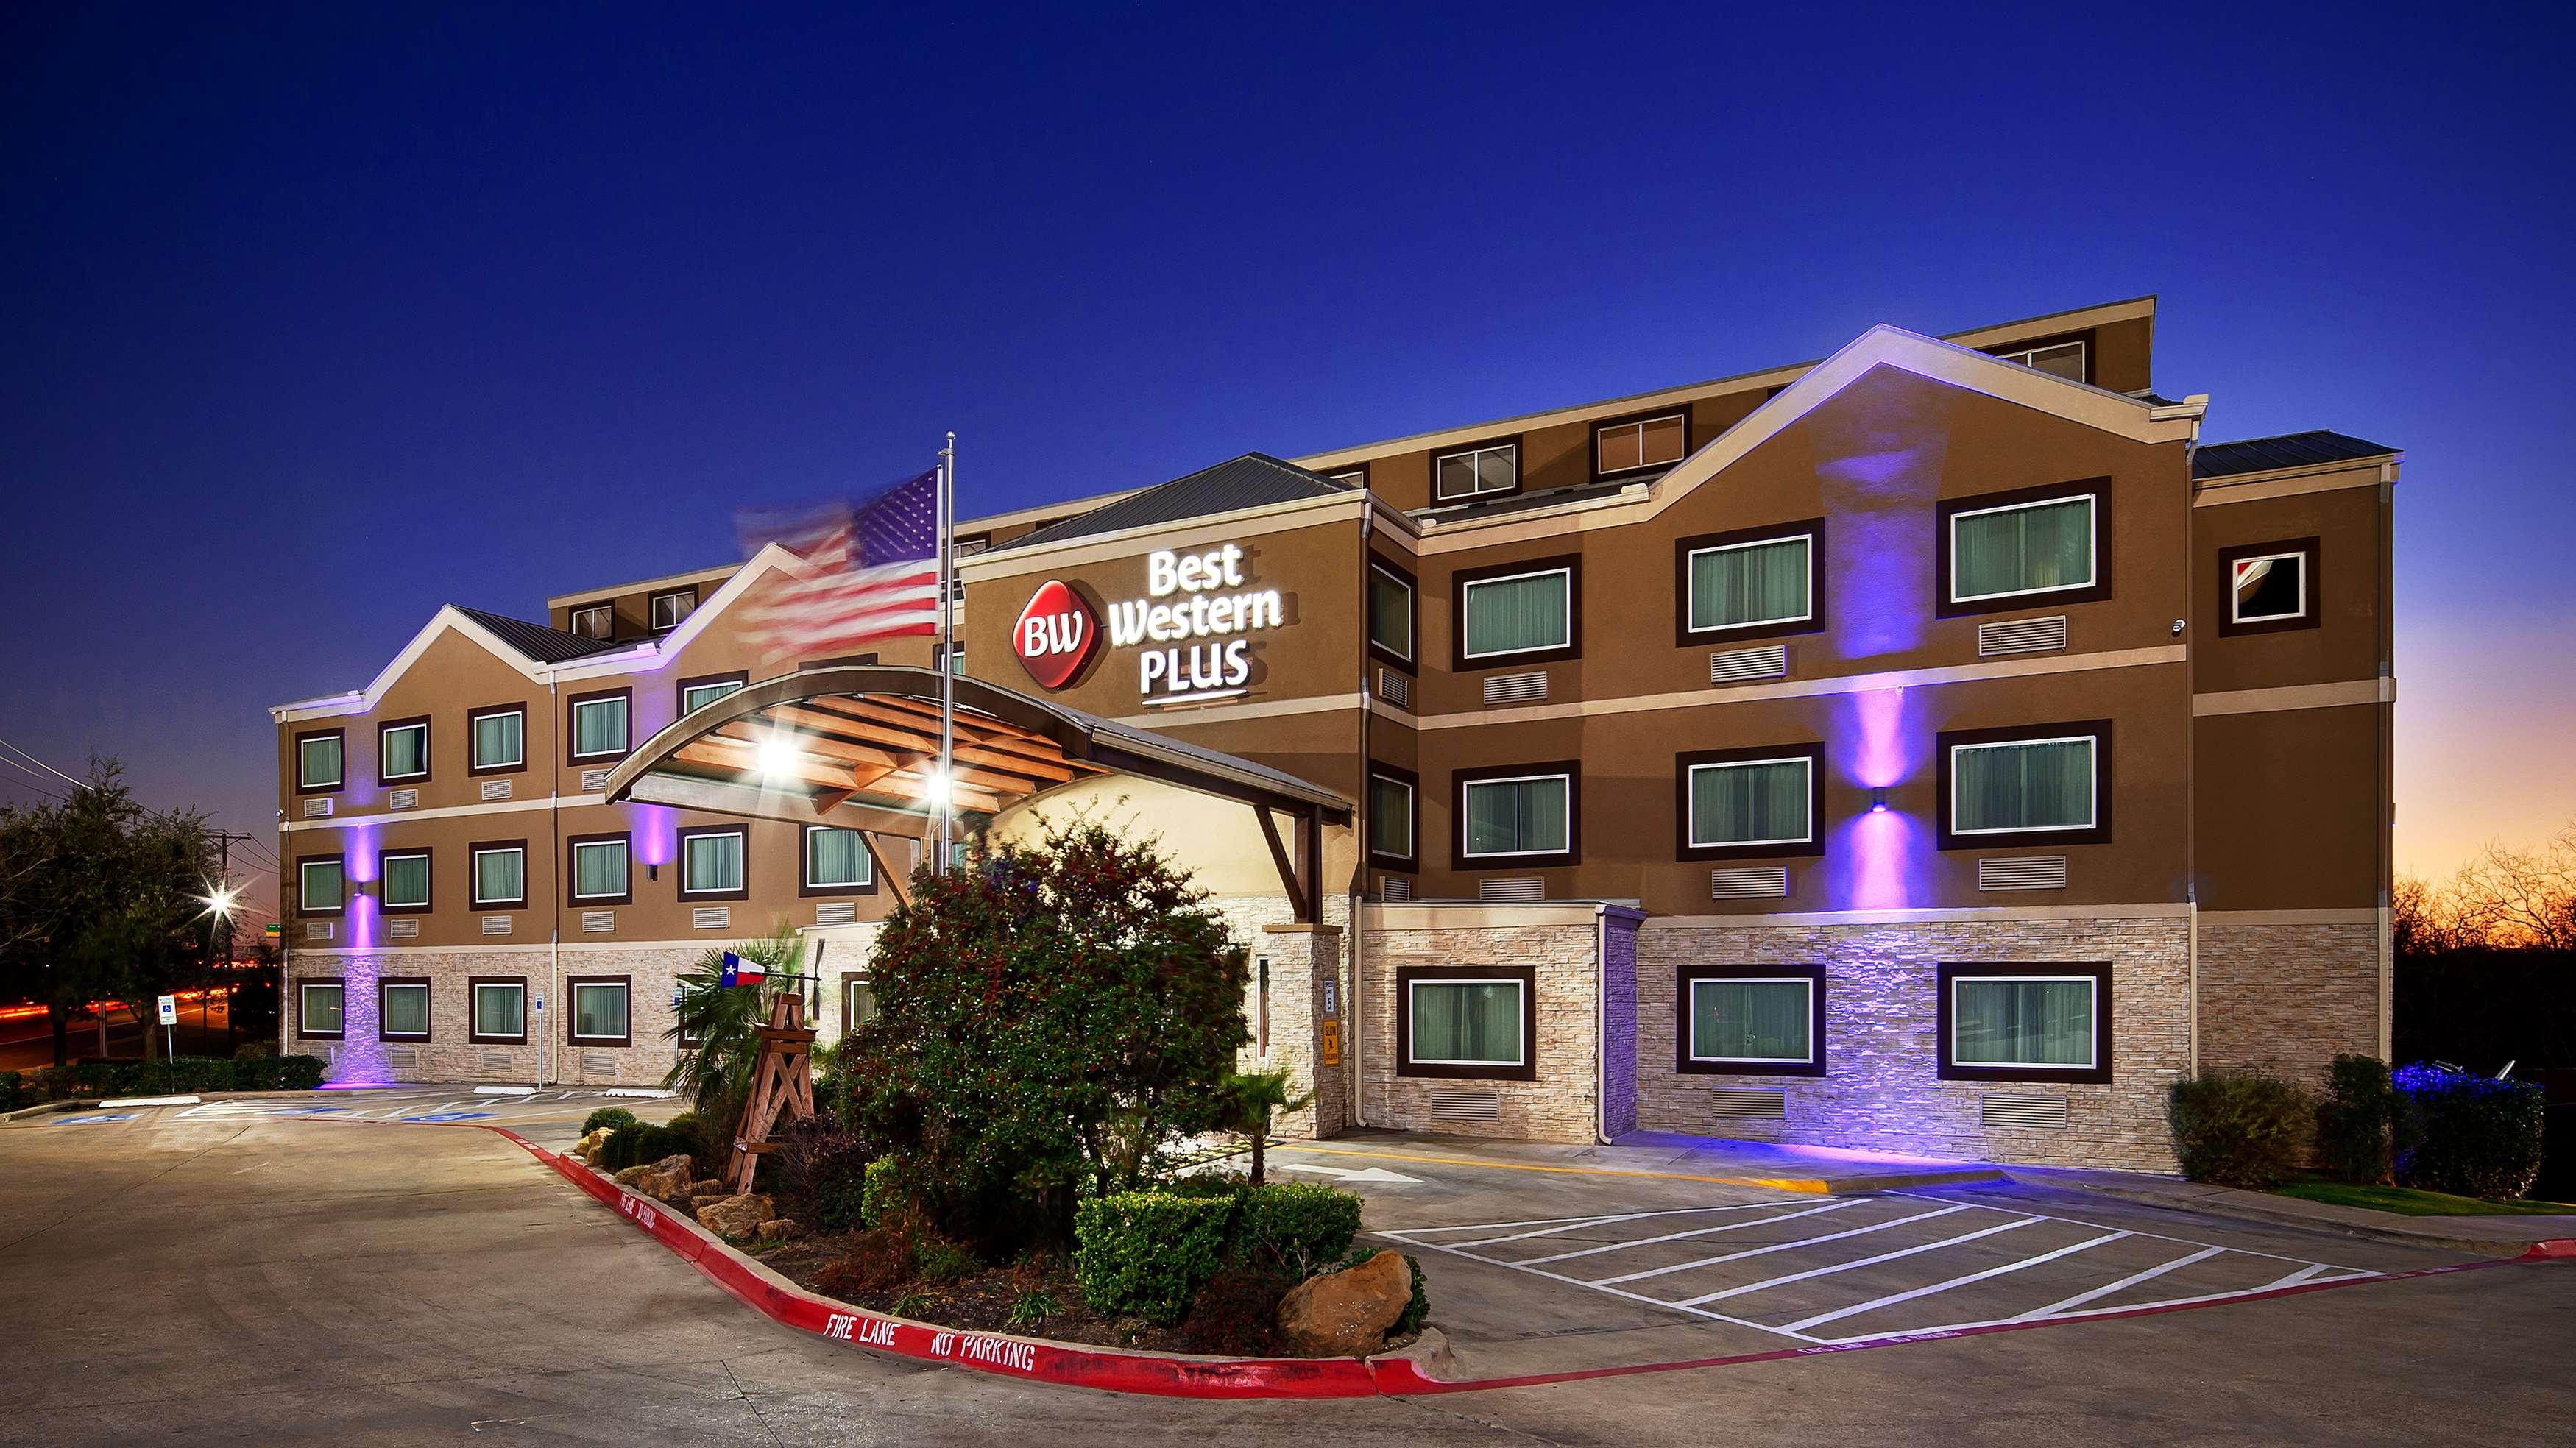 Best Western Plus Arlington North Hotel & Suites image 1